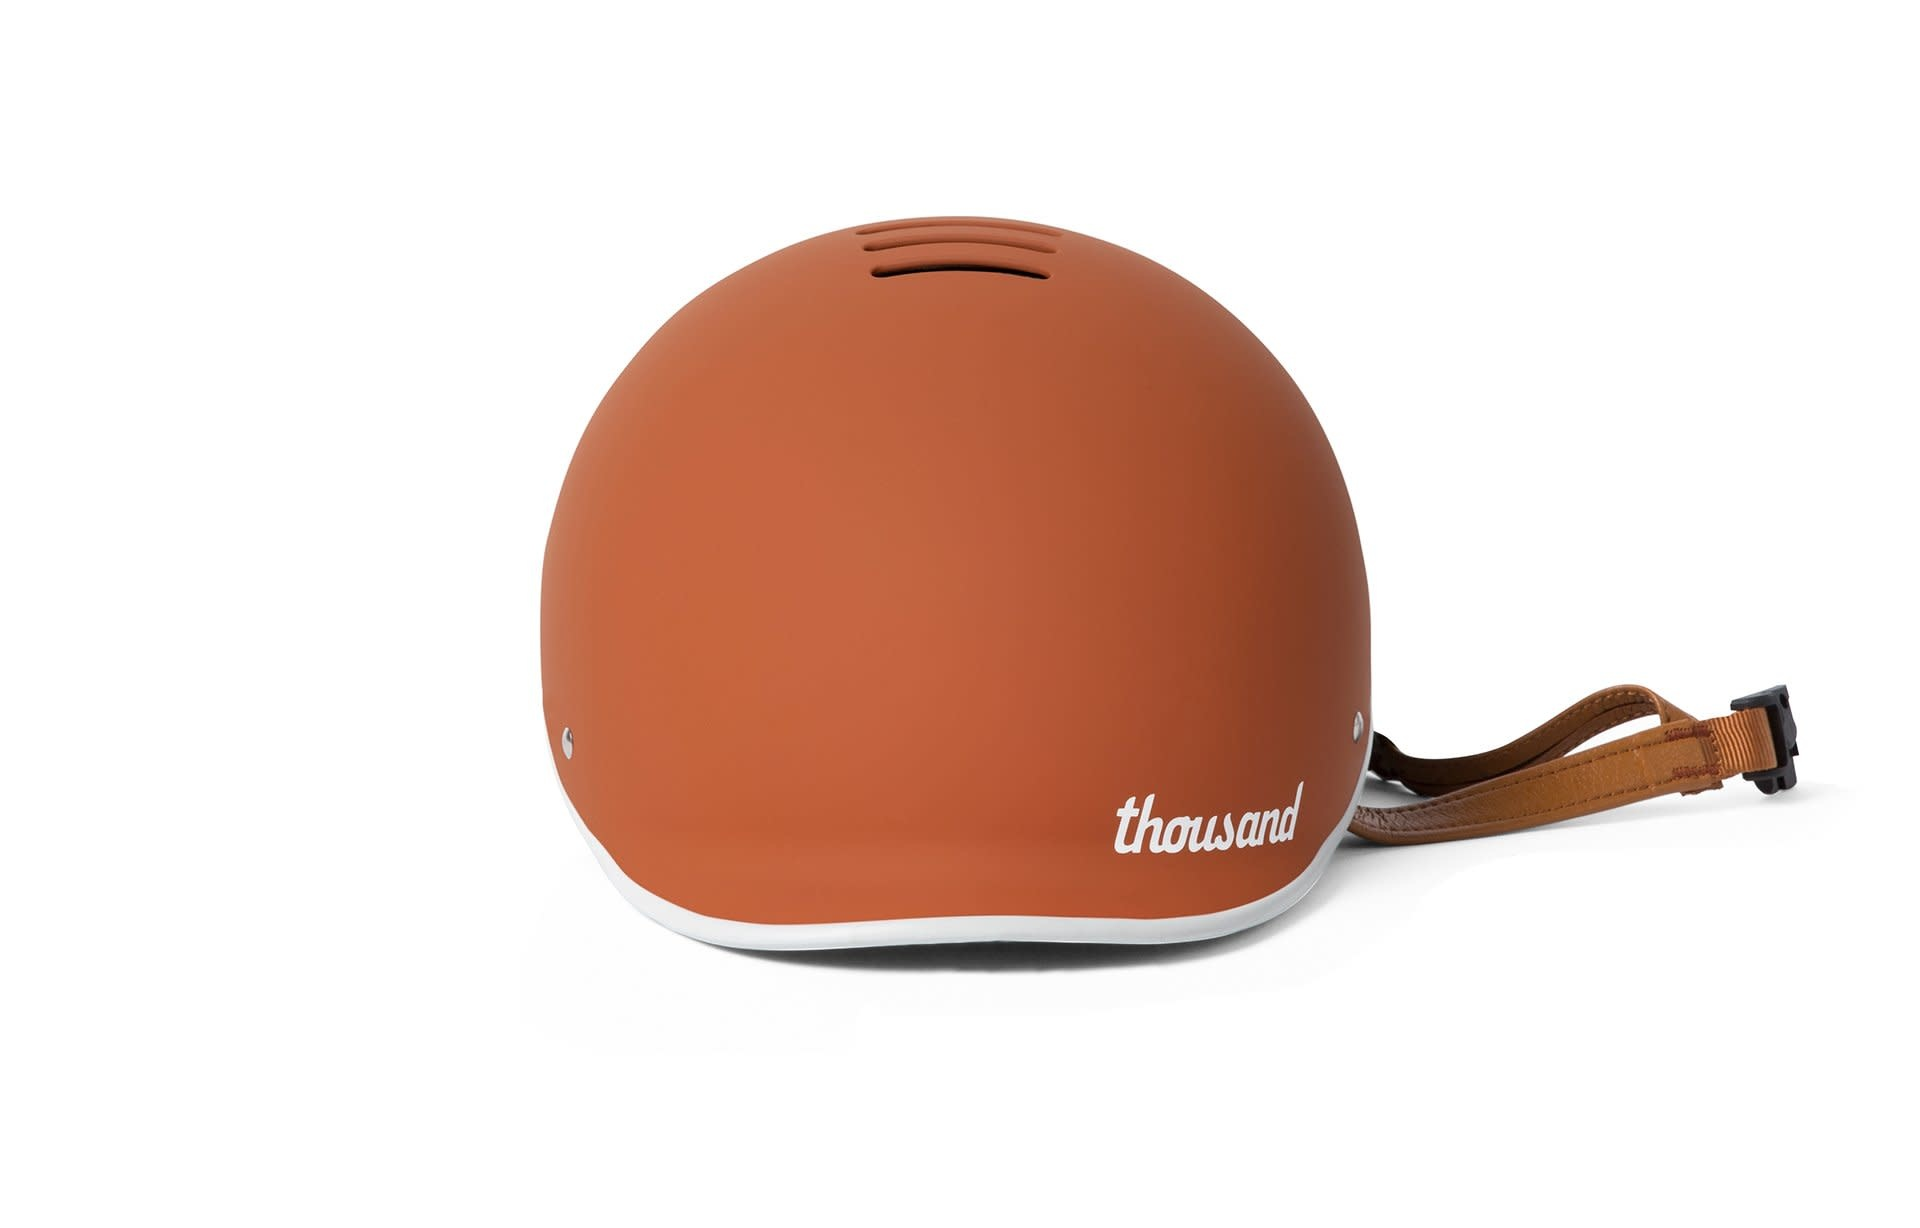 Thousand Helmet - Terra Cotta